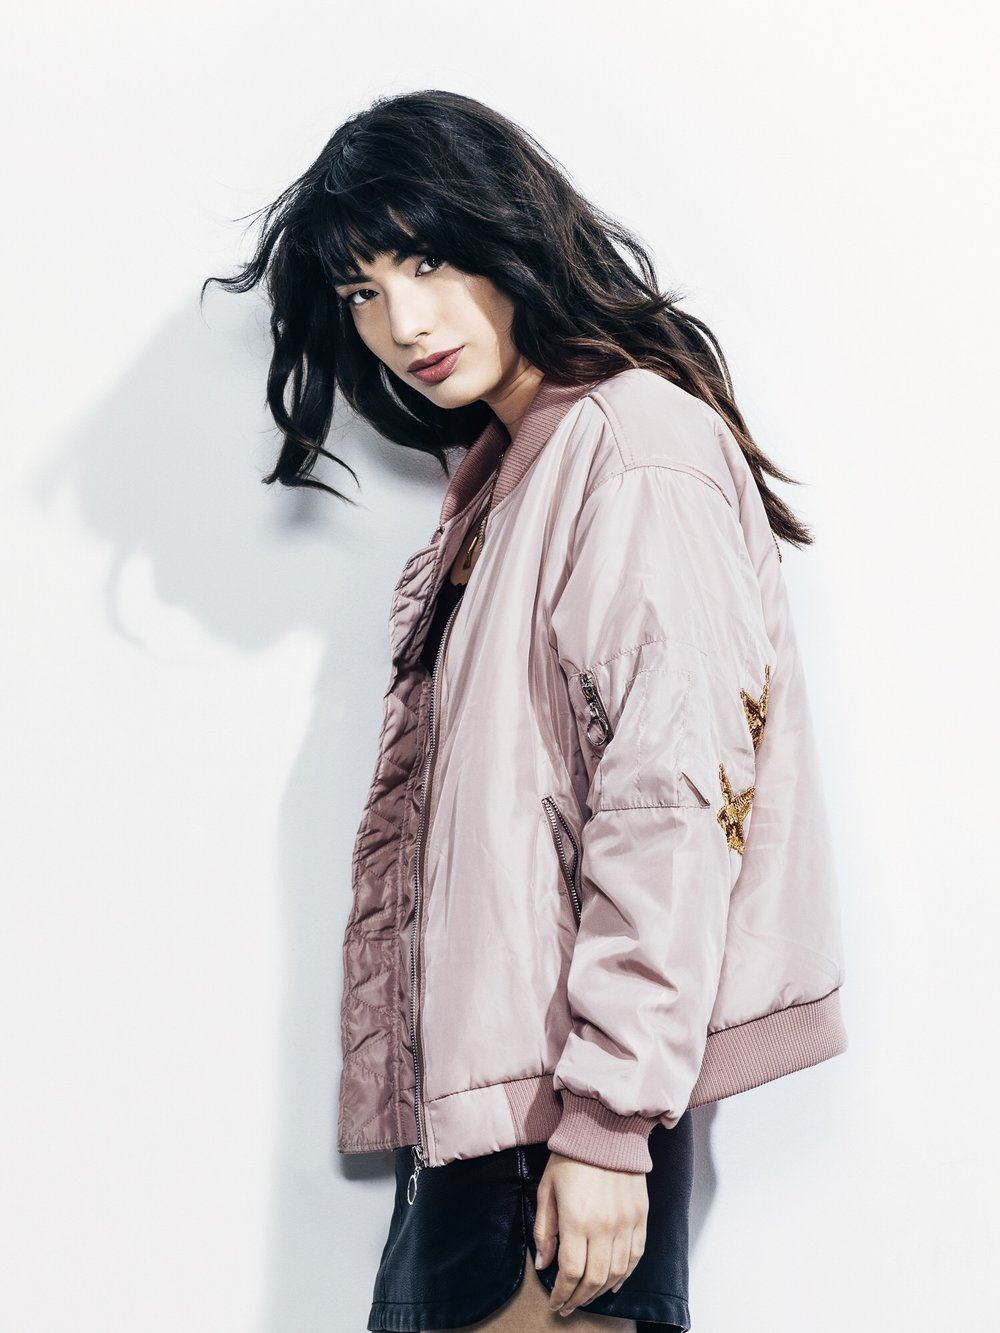 CARO look book shoot for SS17 media requests. Georgia Mae. Urban Outfitters. Photographer: Fab Fernandez #CAROstudio